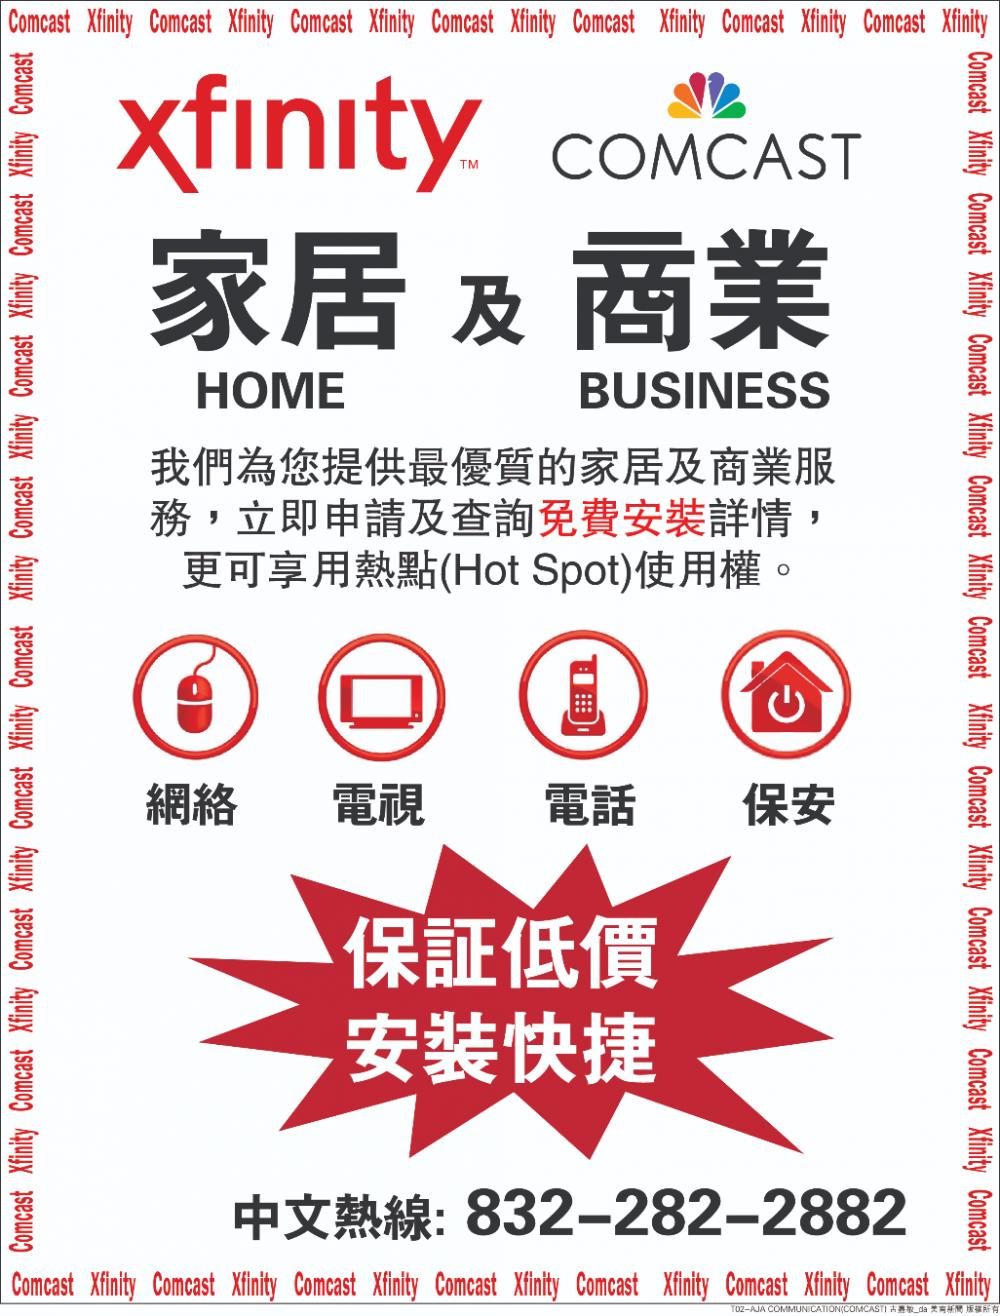 Xfinity 家居及商業網路電視電話保安